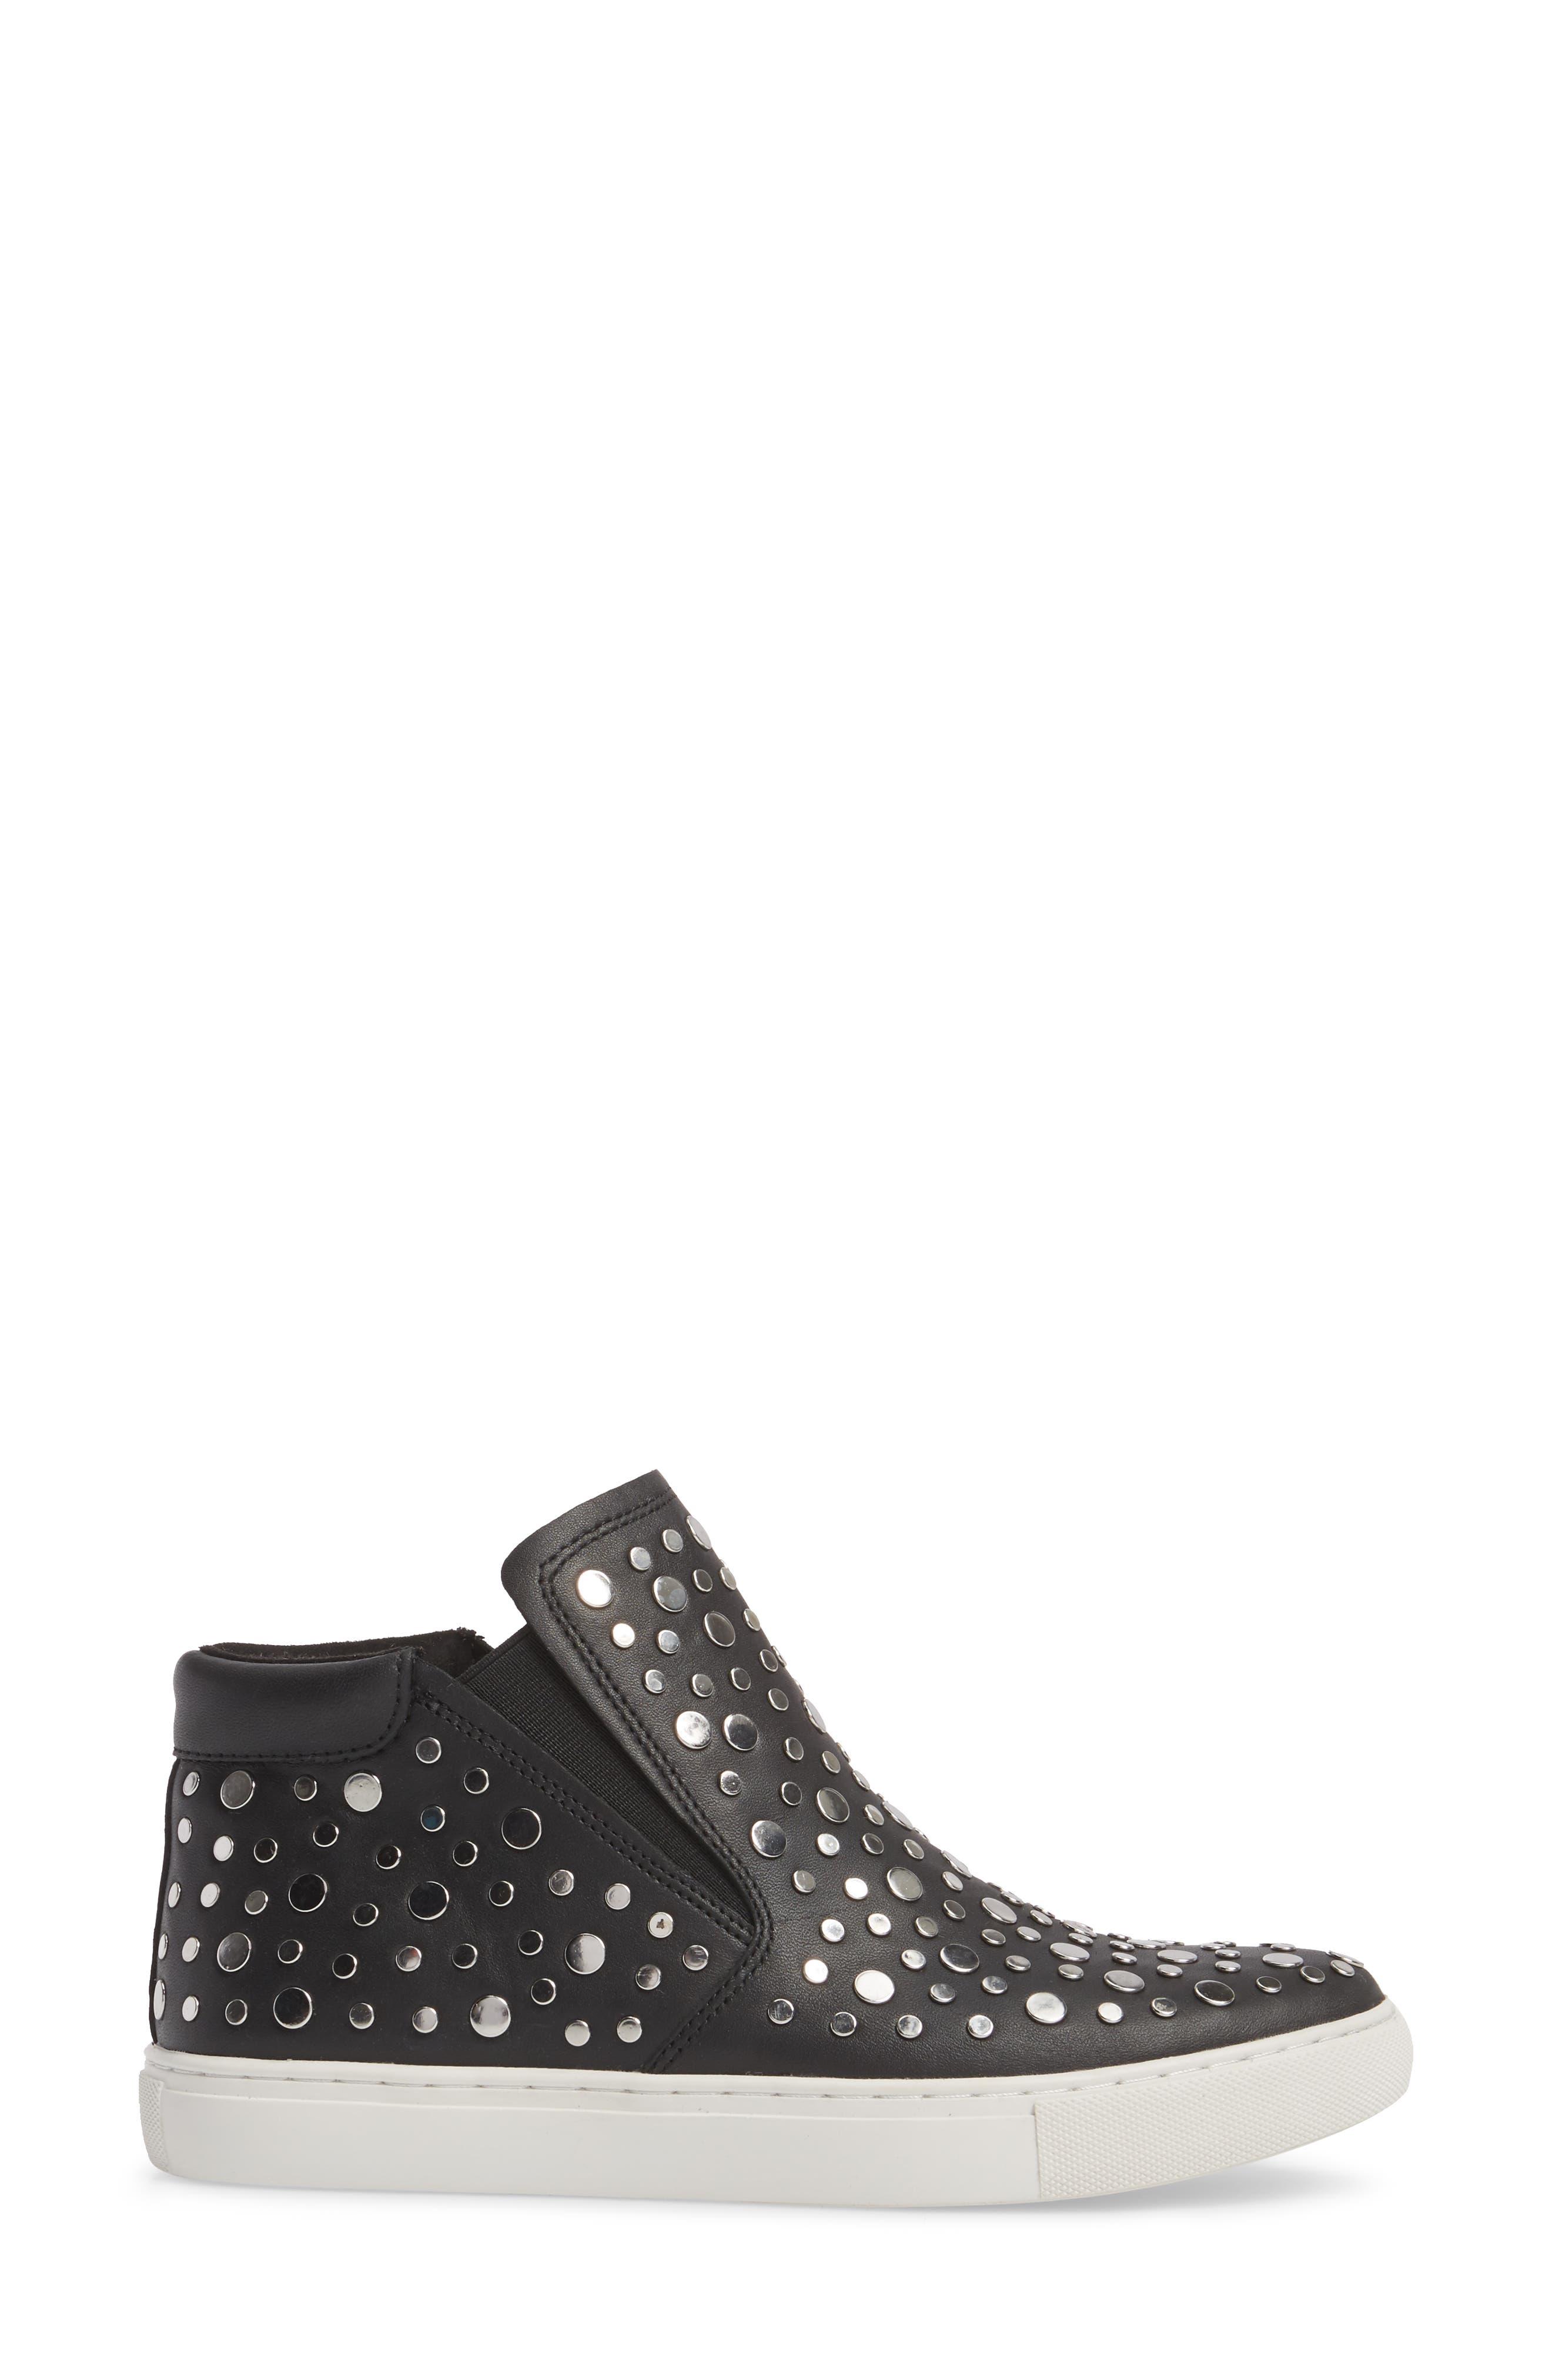 Kalvin Studded High Top Sneaker,                             Alternate thumbnail 3, color,                             Black Leather